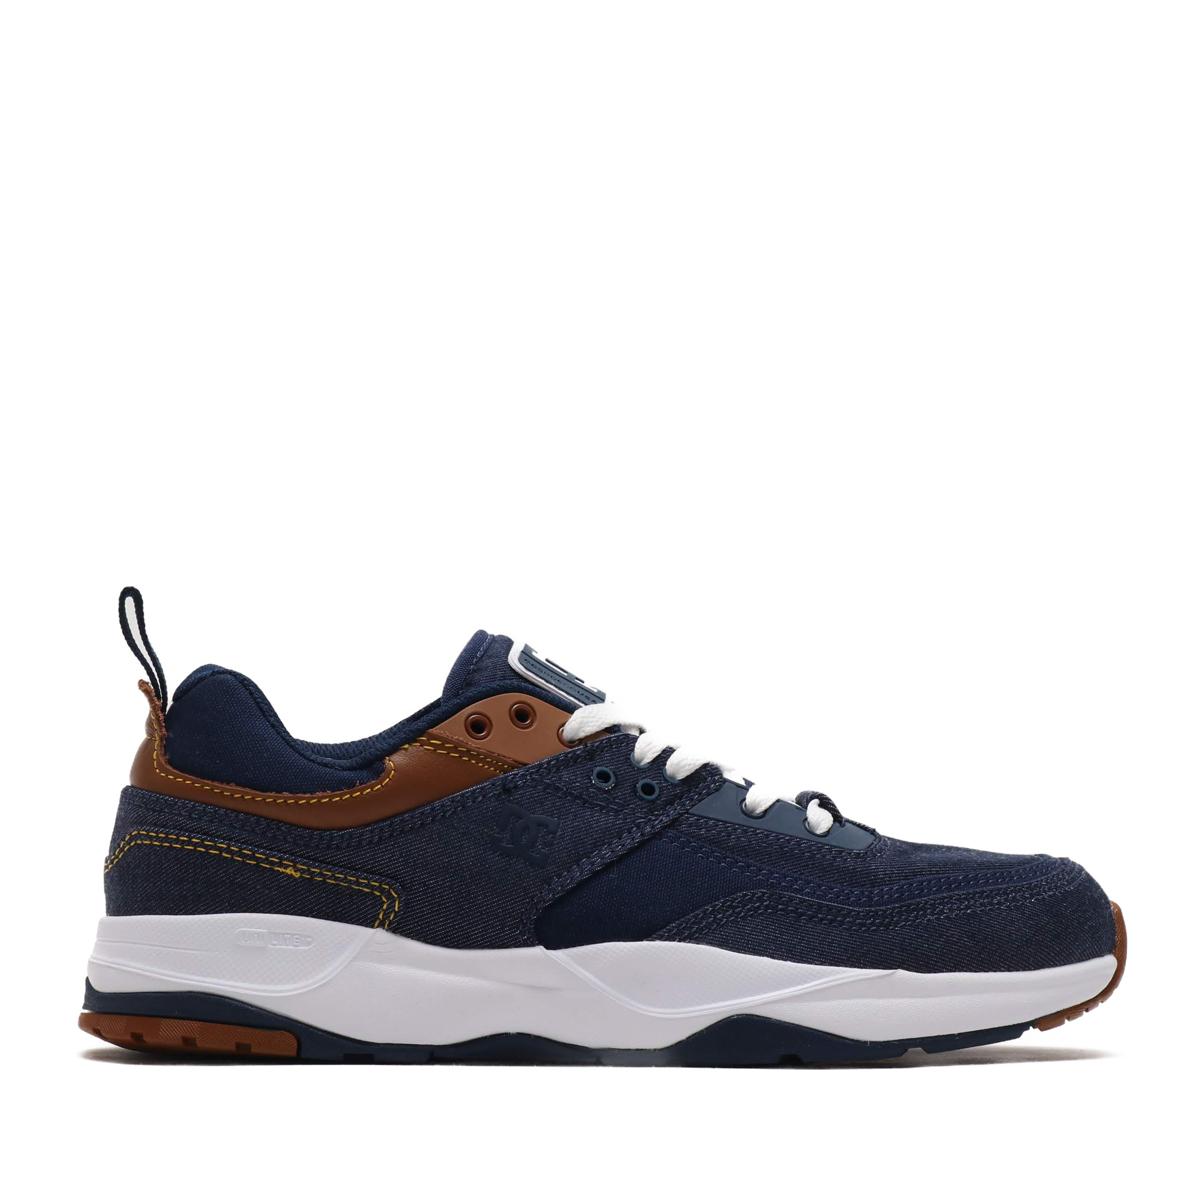 wholesale dealer 50251 ff3c6 DC SHOES E.TRIBEKA TX SE (DENIM) (D sea shoes eat rye Bekka tea X S E)